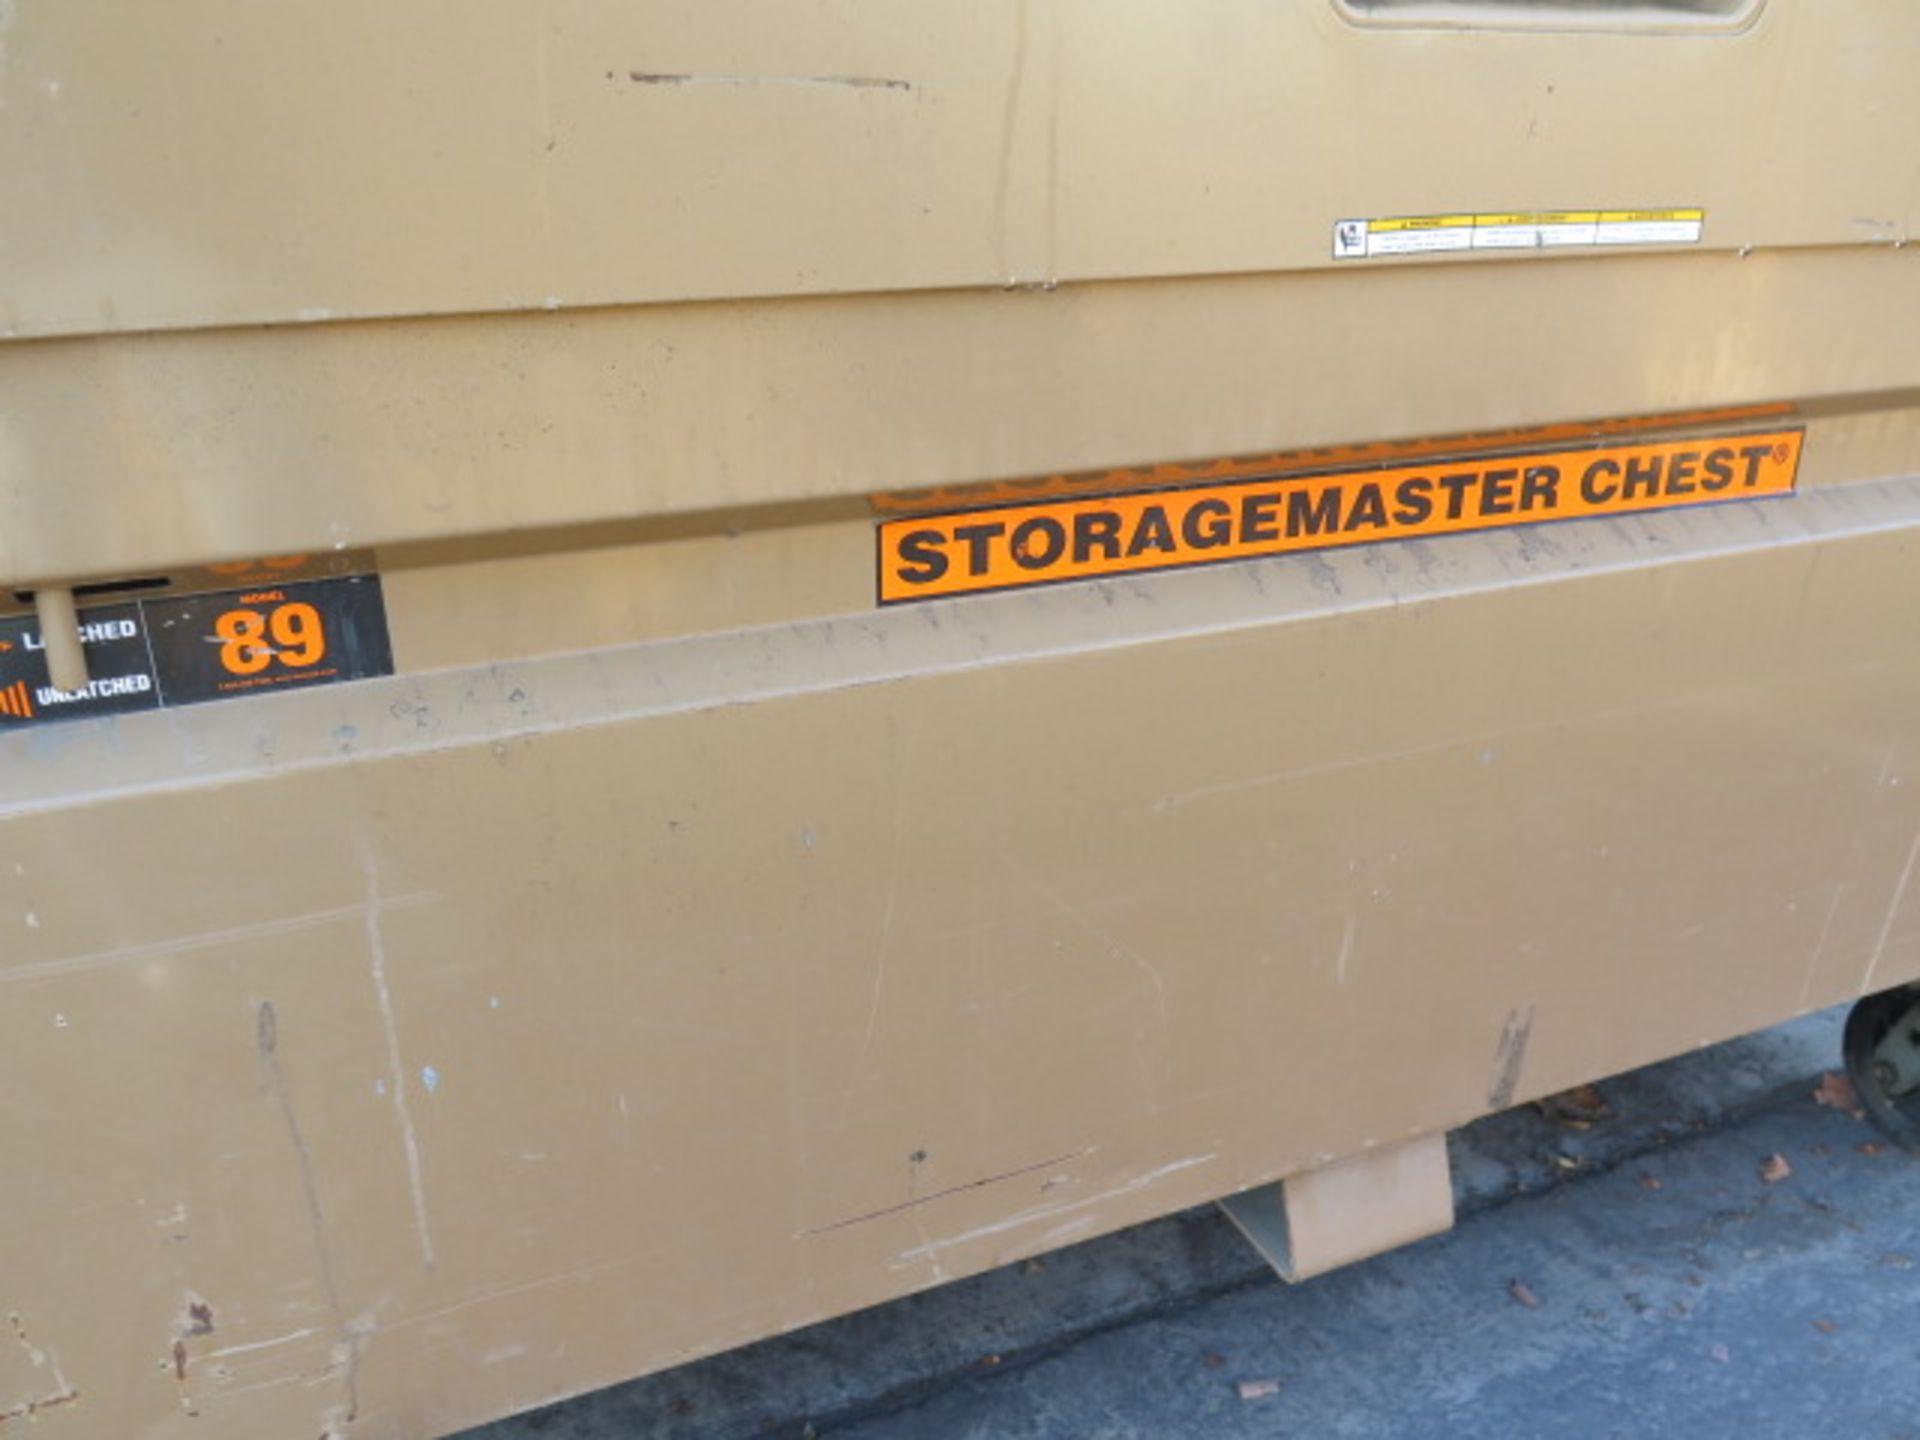 Knaack mdl. 89 Storagemaster Rolling Job Box w/ Ridgid Tri-Stands (SOLD AS-IS - NO WARRANTY) - Image 3 of 11